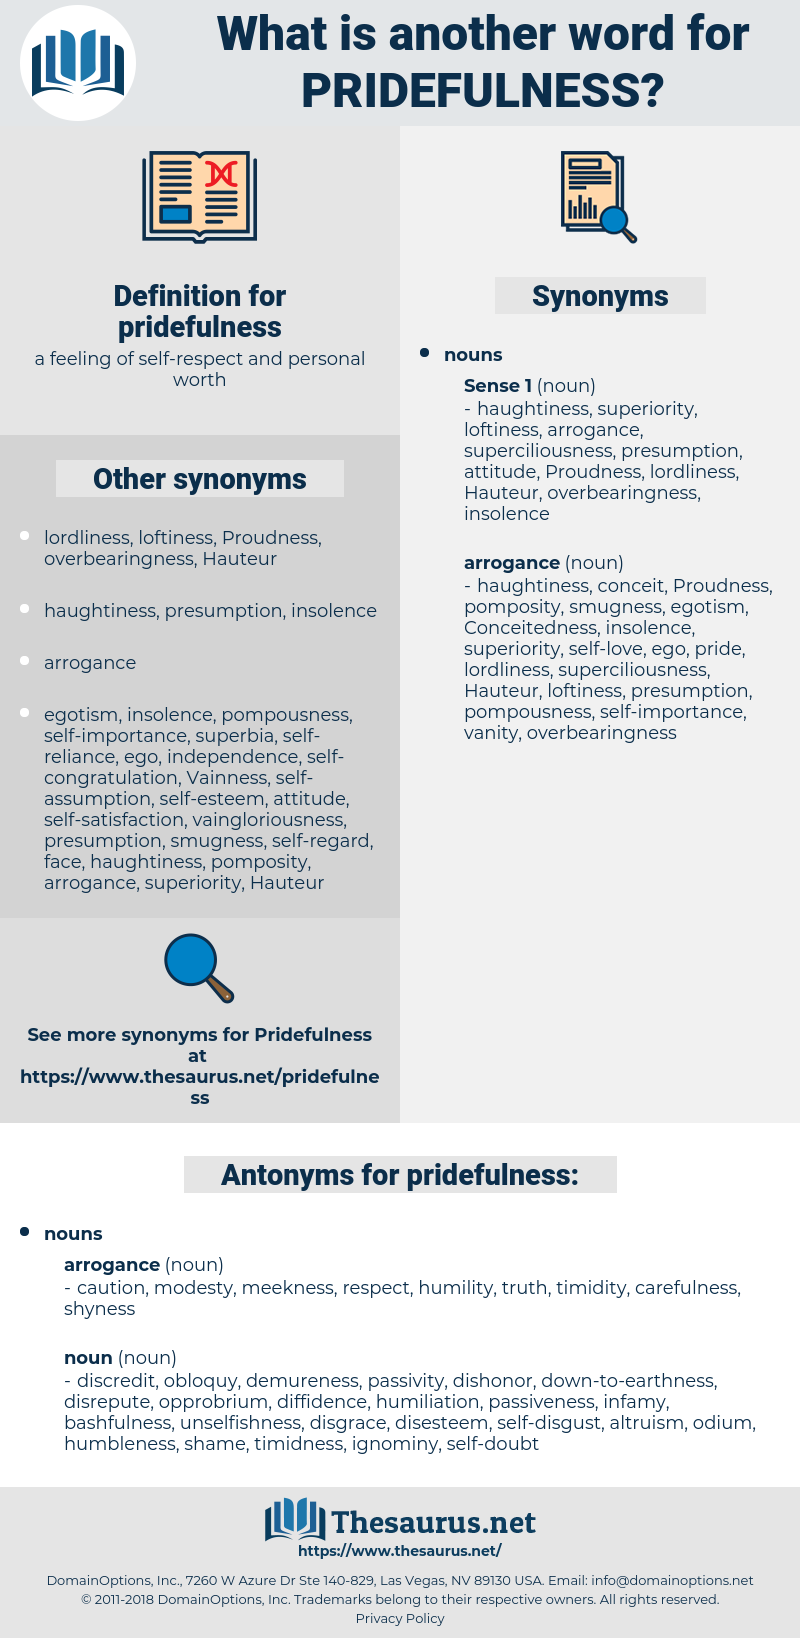 pridefulness, synonym pridefulness, another word for pridefulness, words like pridefulness, thesaurus pridefulness